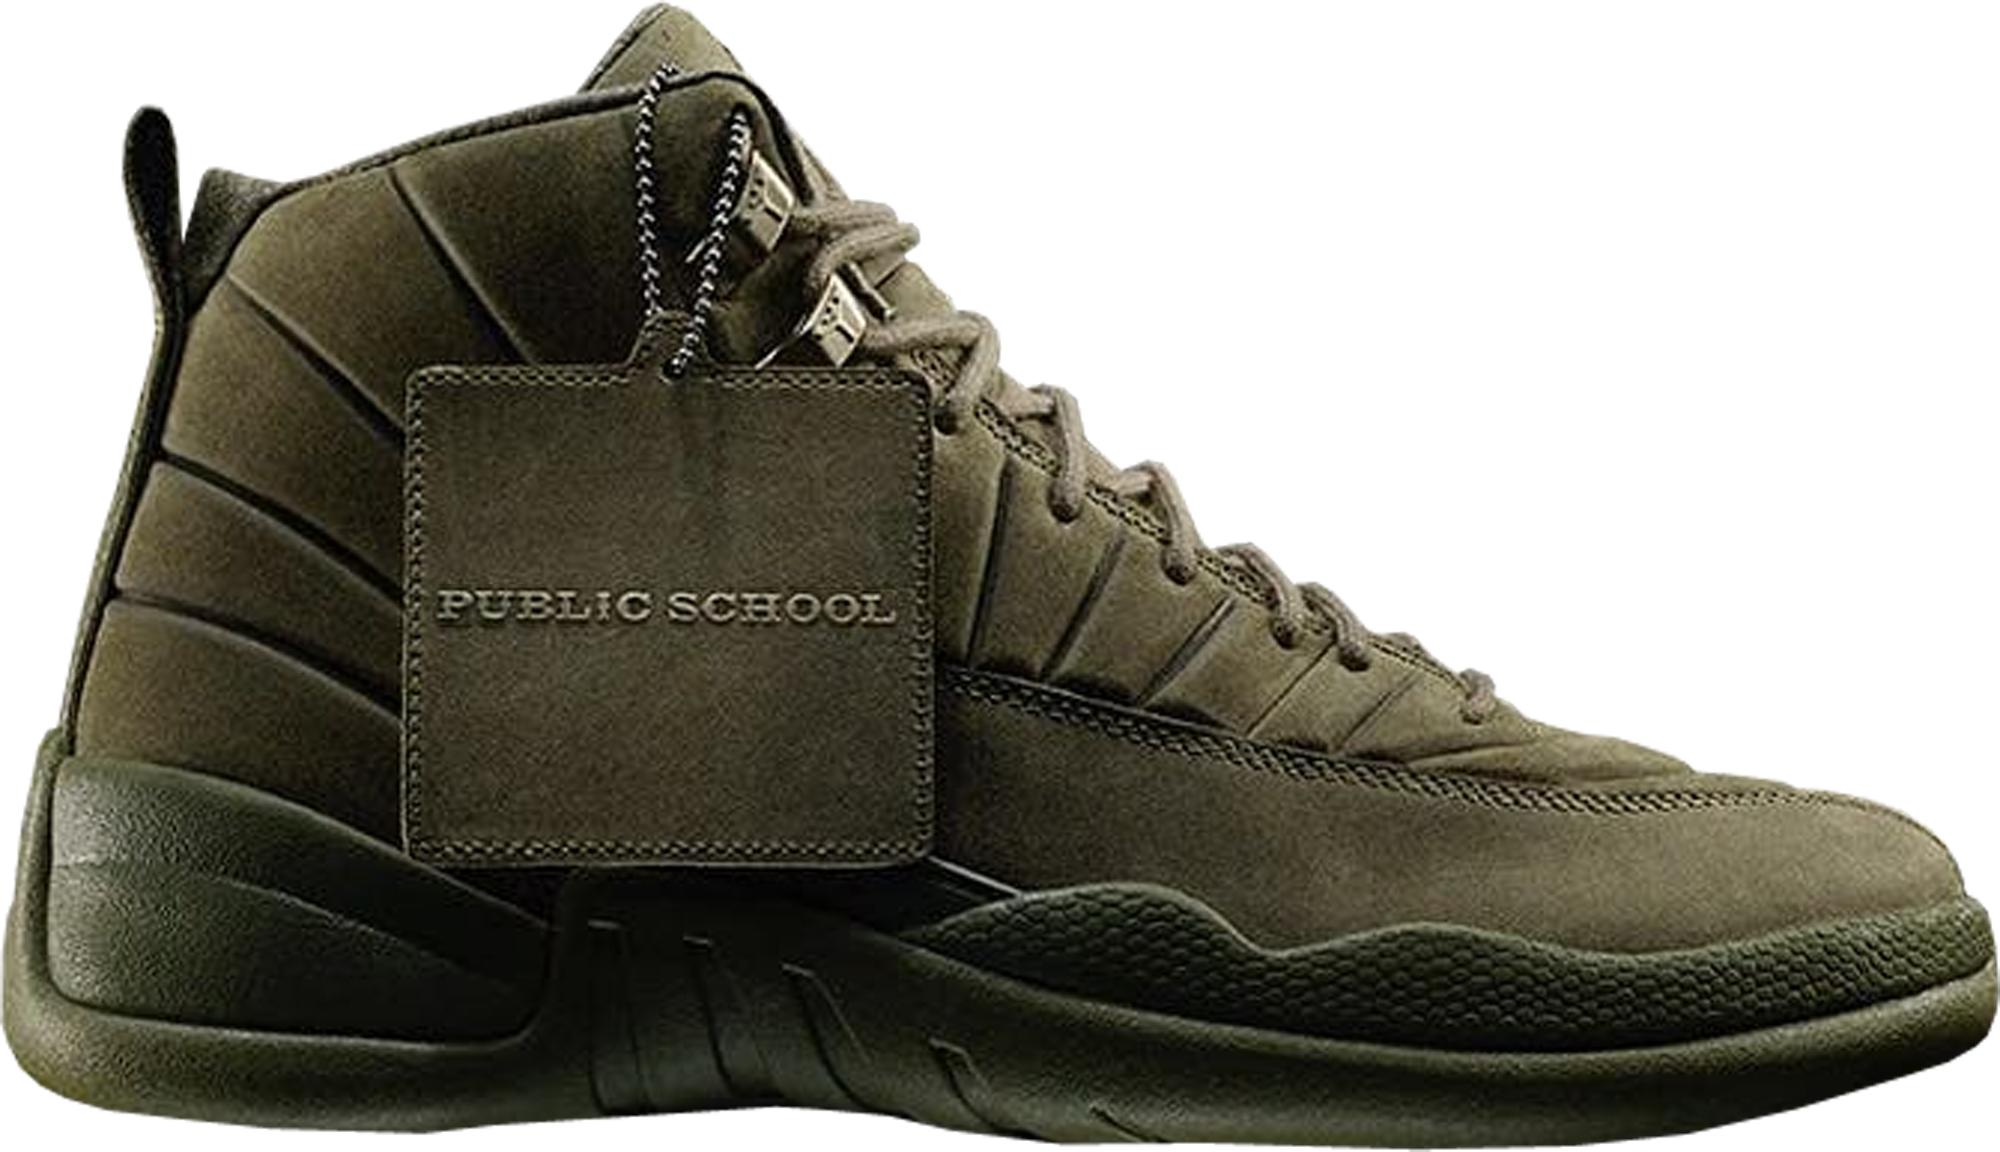 Jordan 12 Retro PSNY Olive